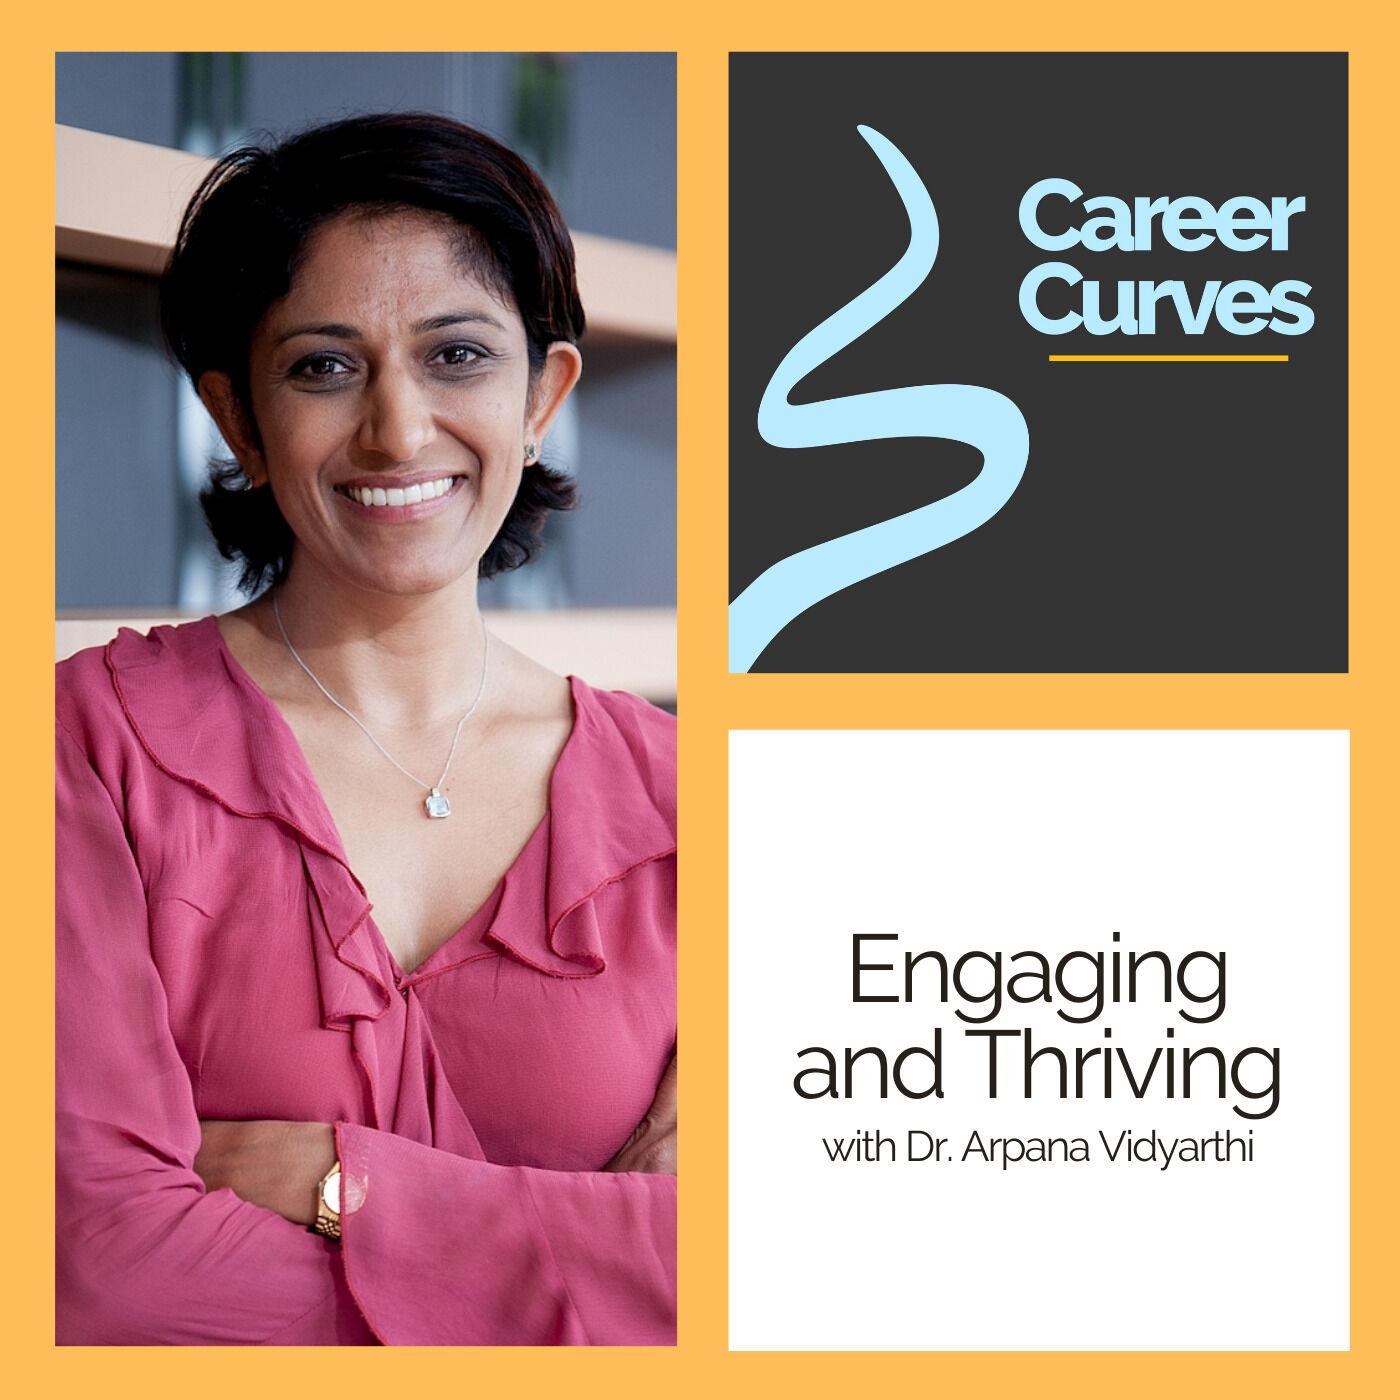 Engaging and Thriving with Dr. Arpana Vidyarthi